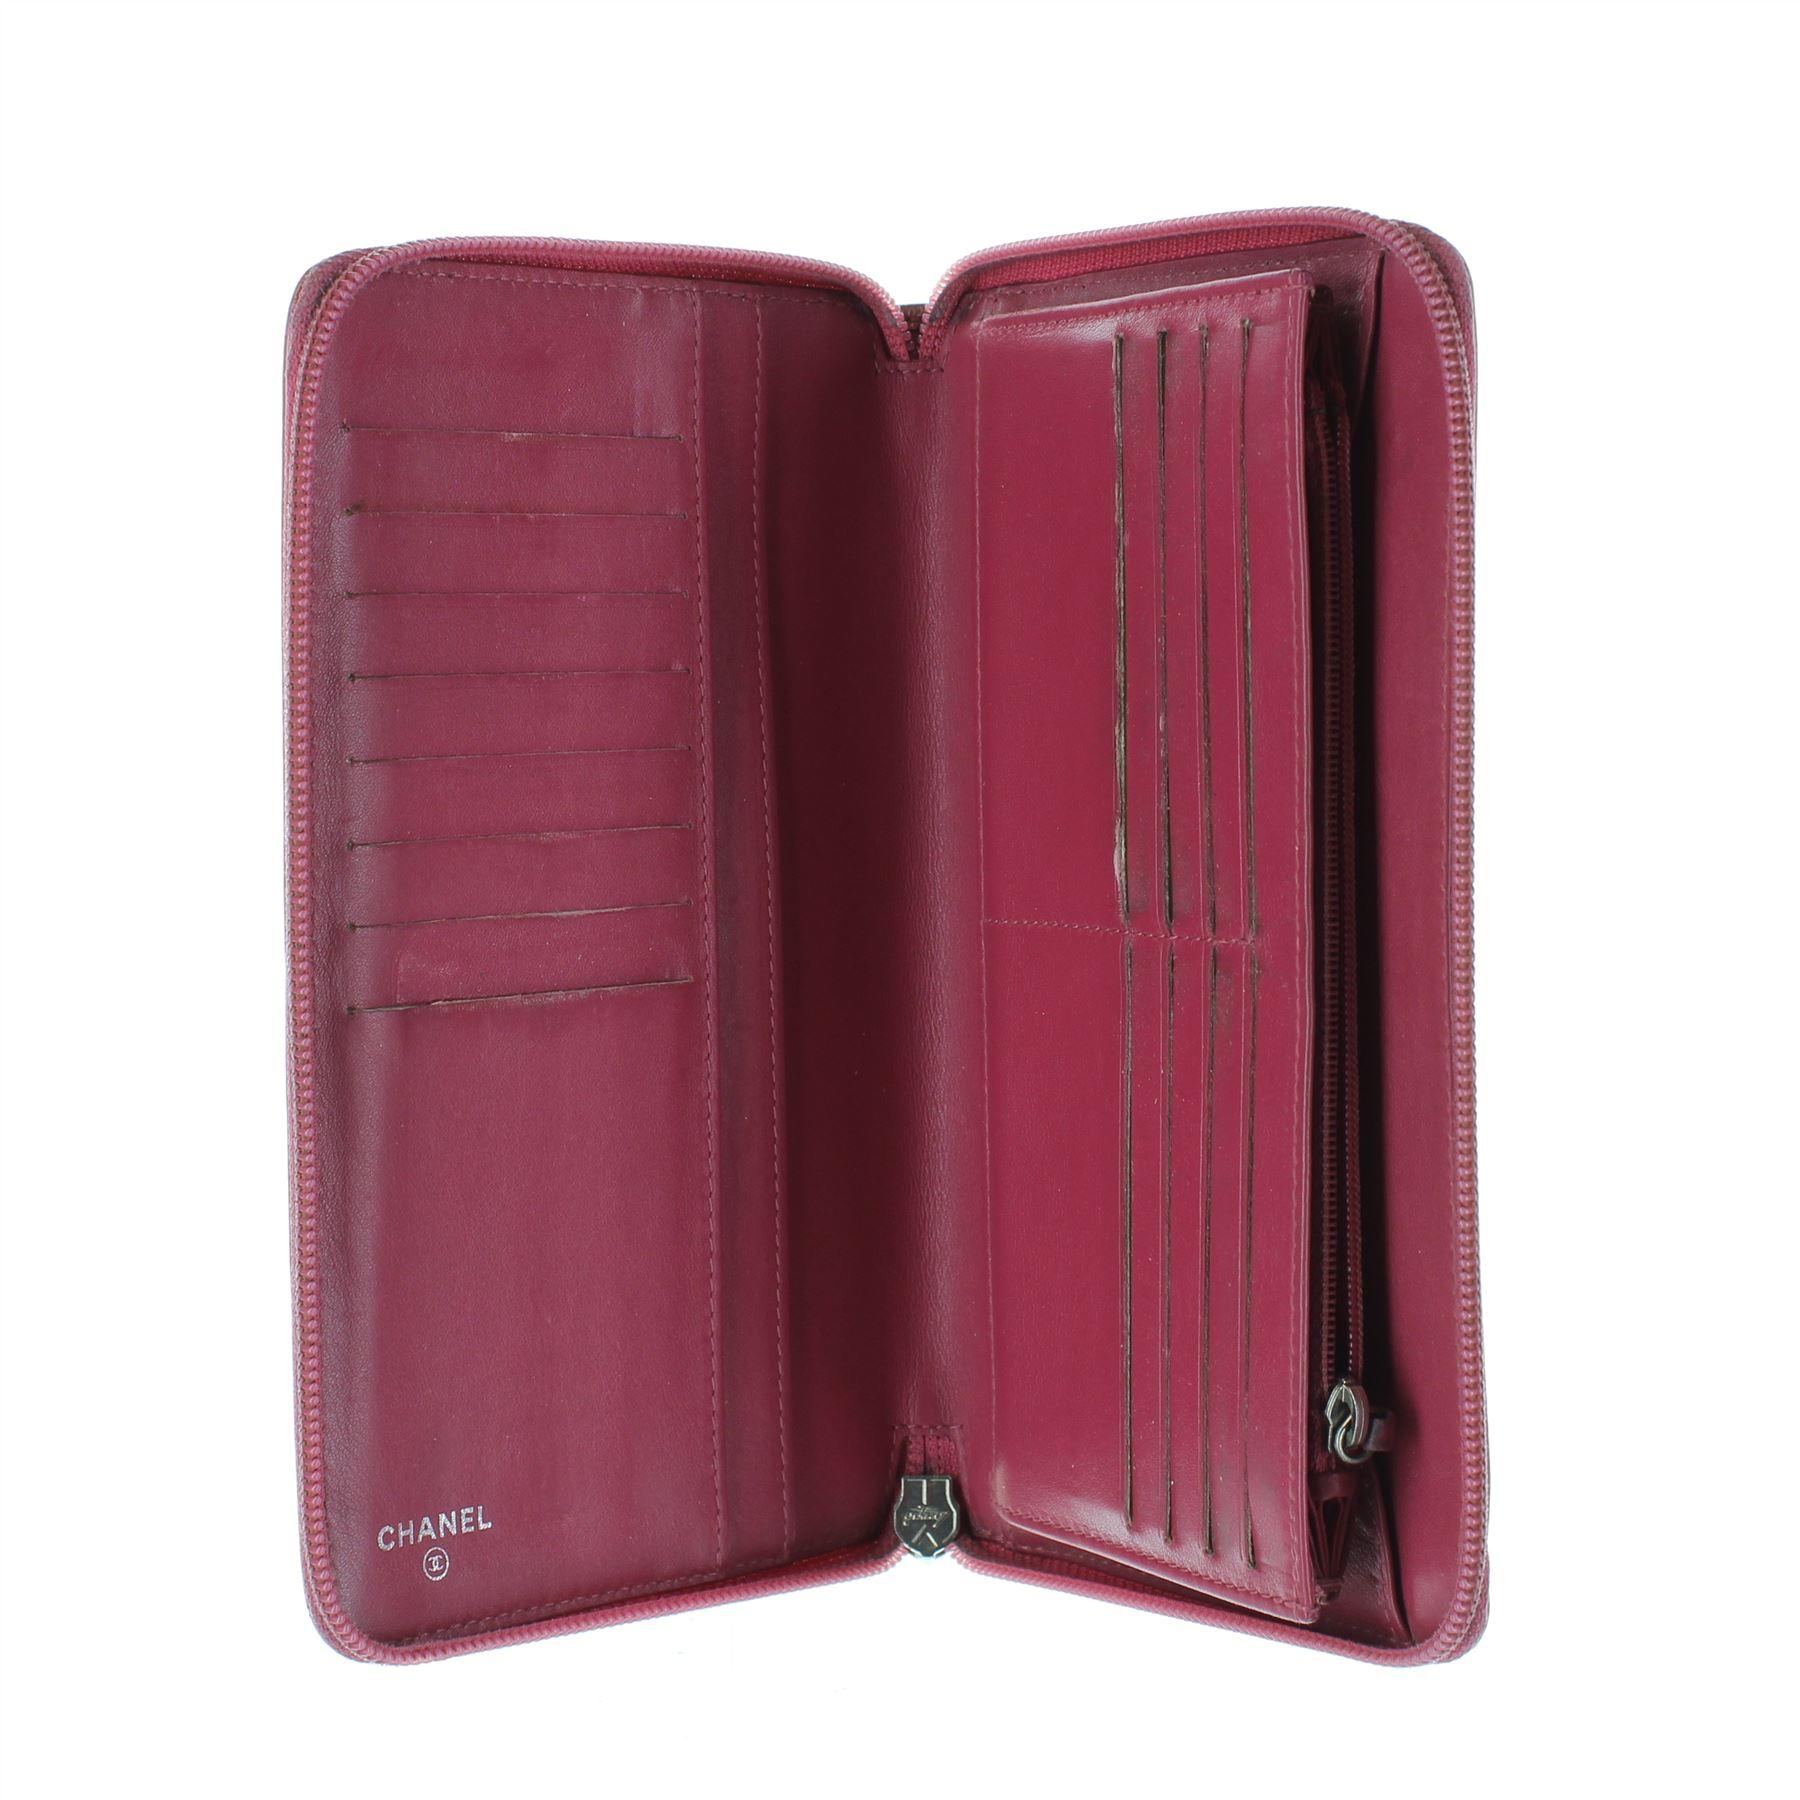 CHANEL Camelia Porte-monnaie   sac à main rose en cuir verni, 5